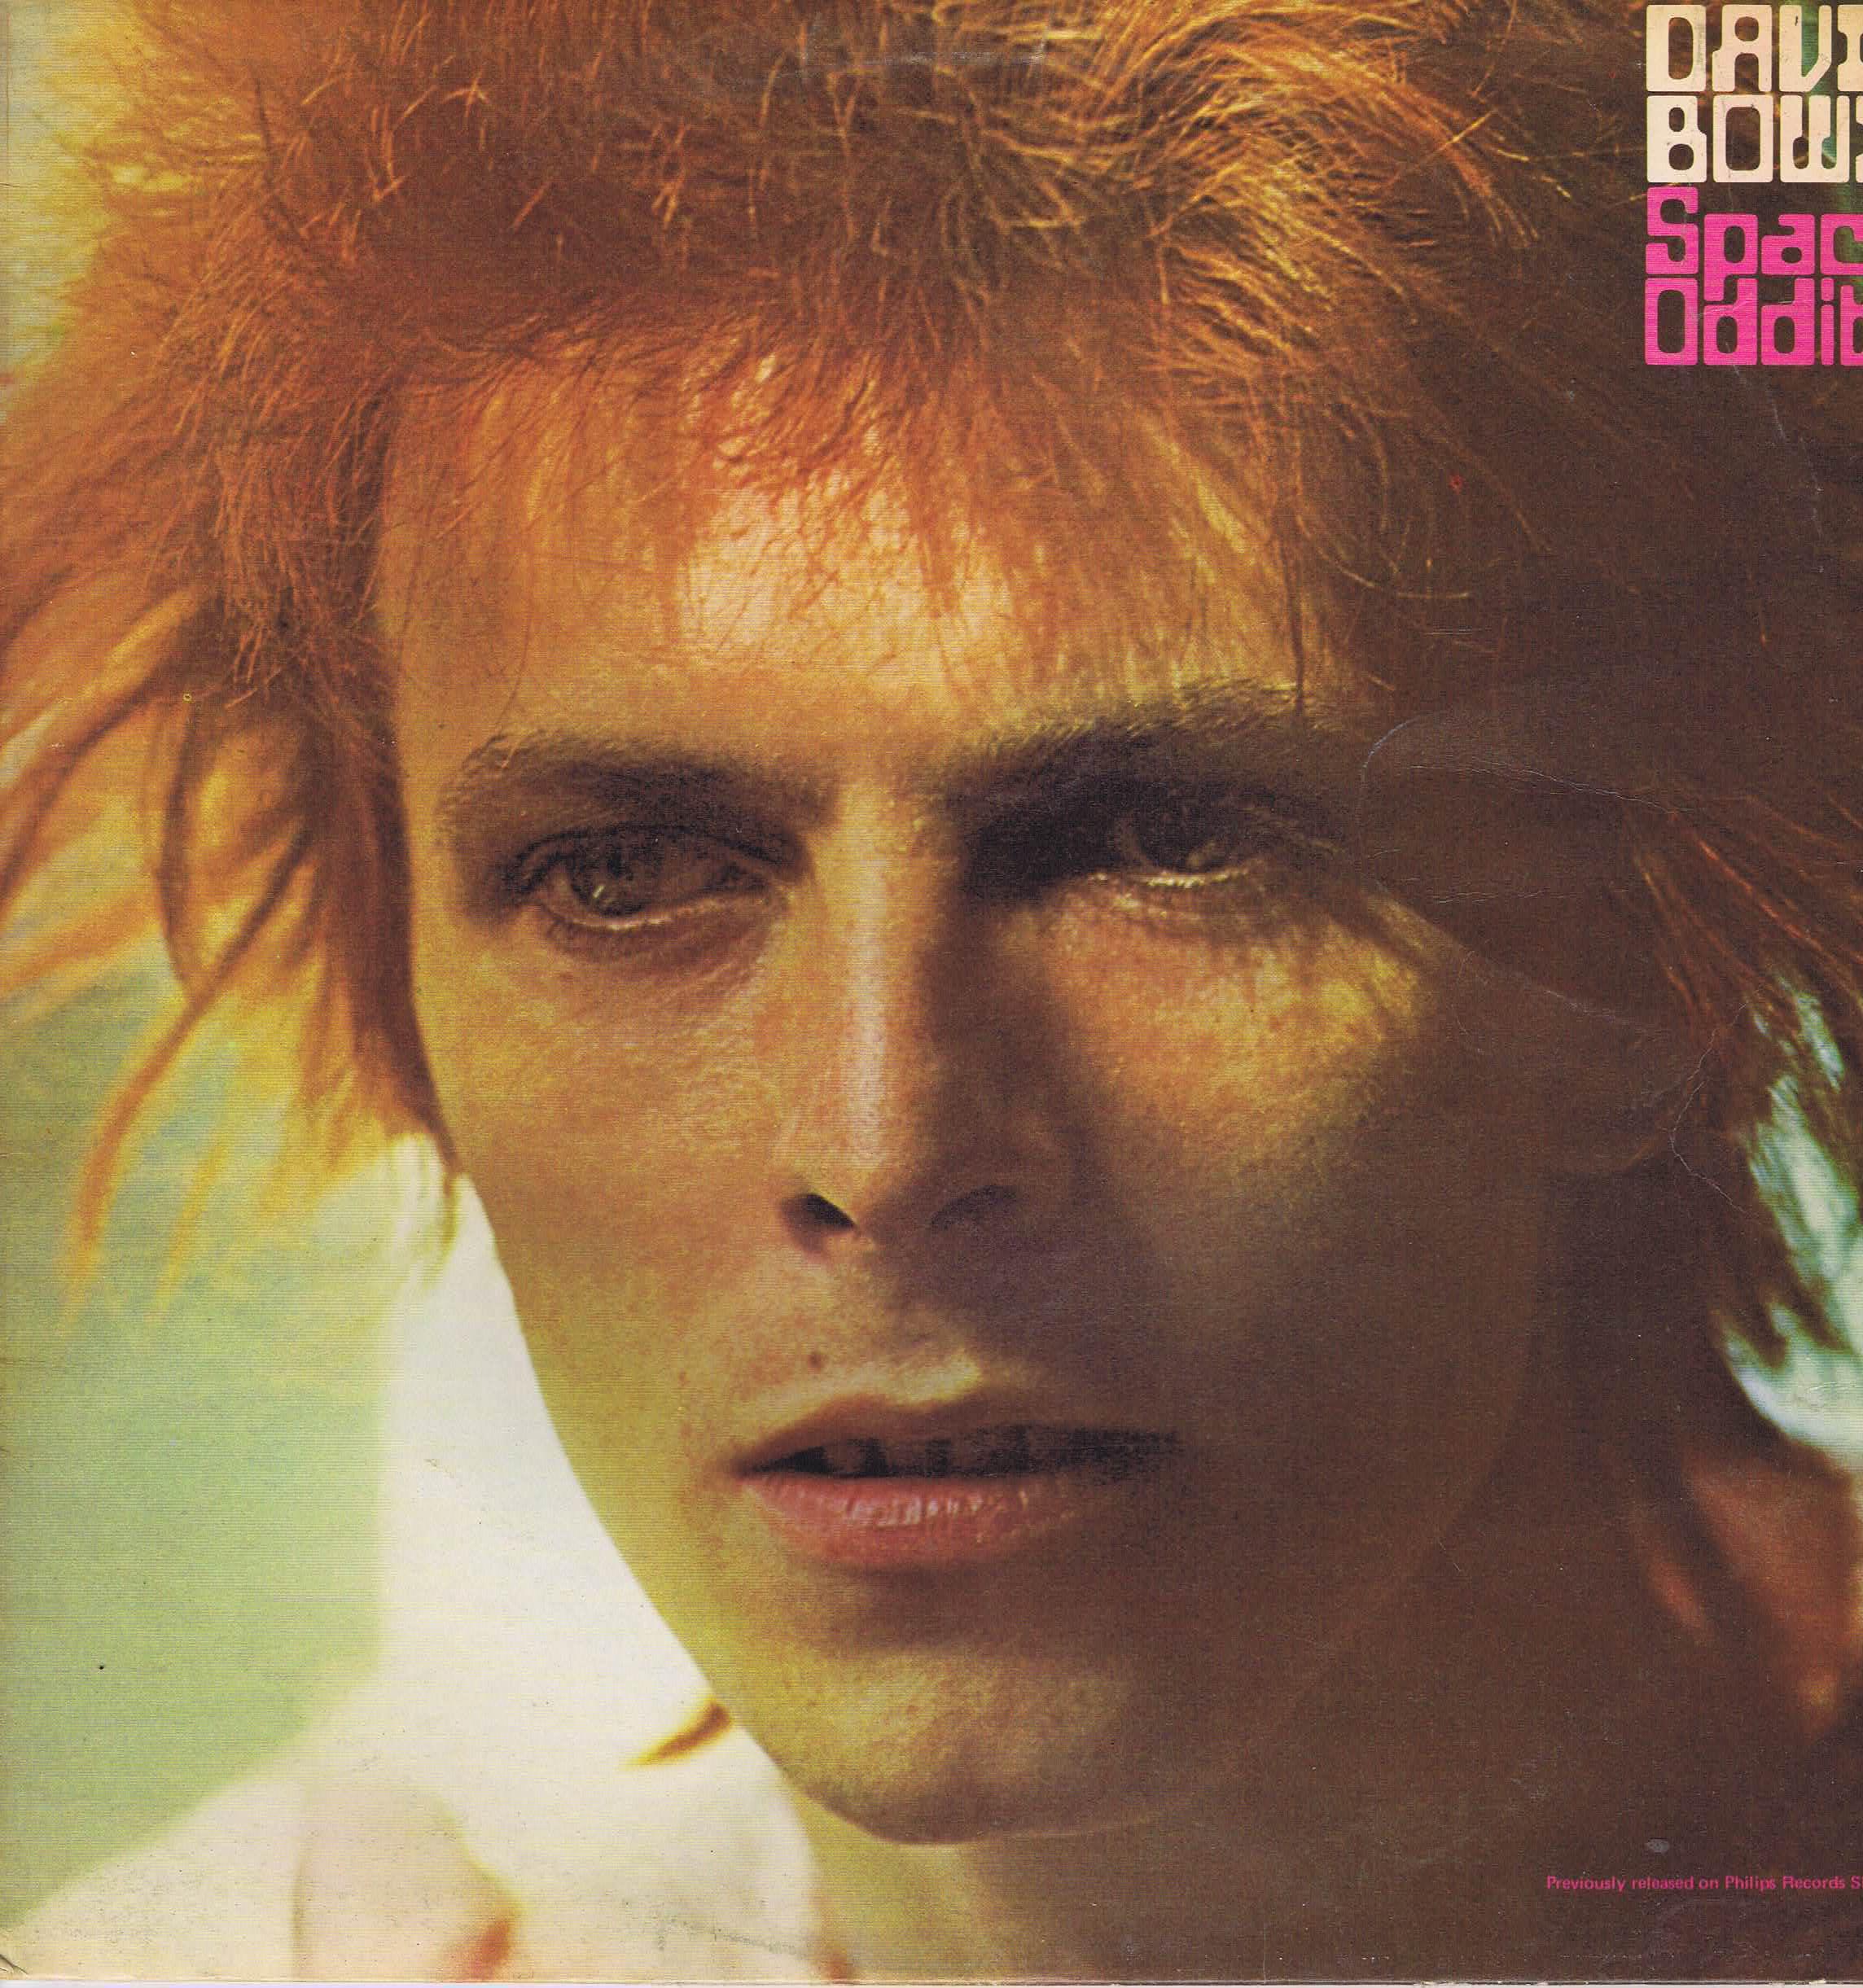 David Bowie – Space Oddity - LSP 4813